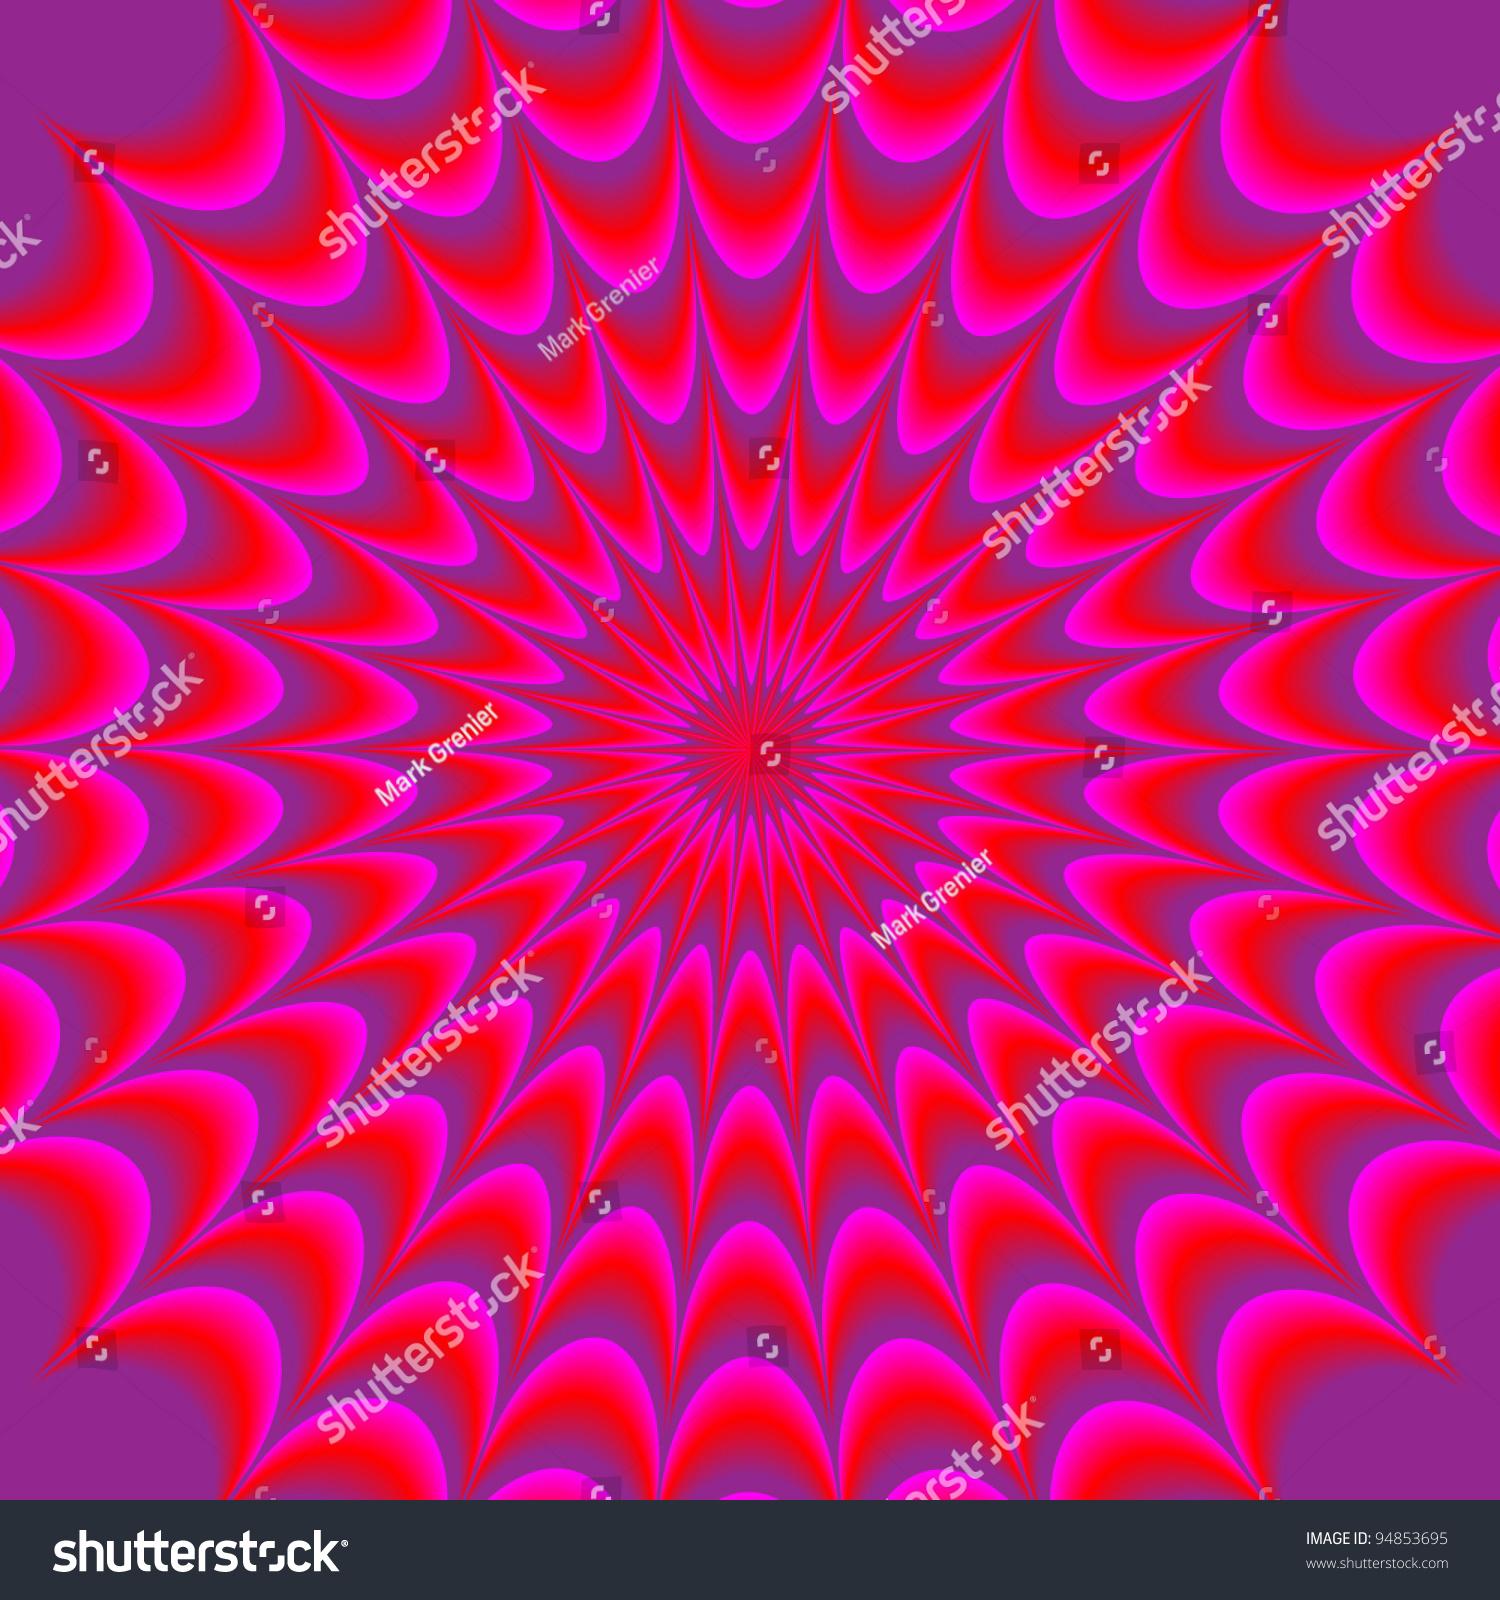 flower power illusion - photo #2